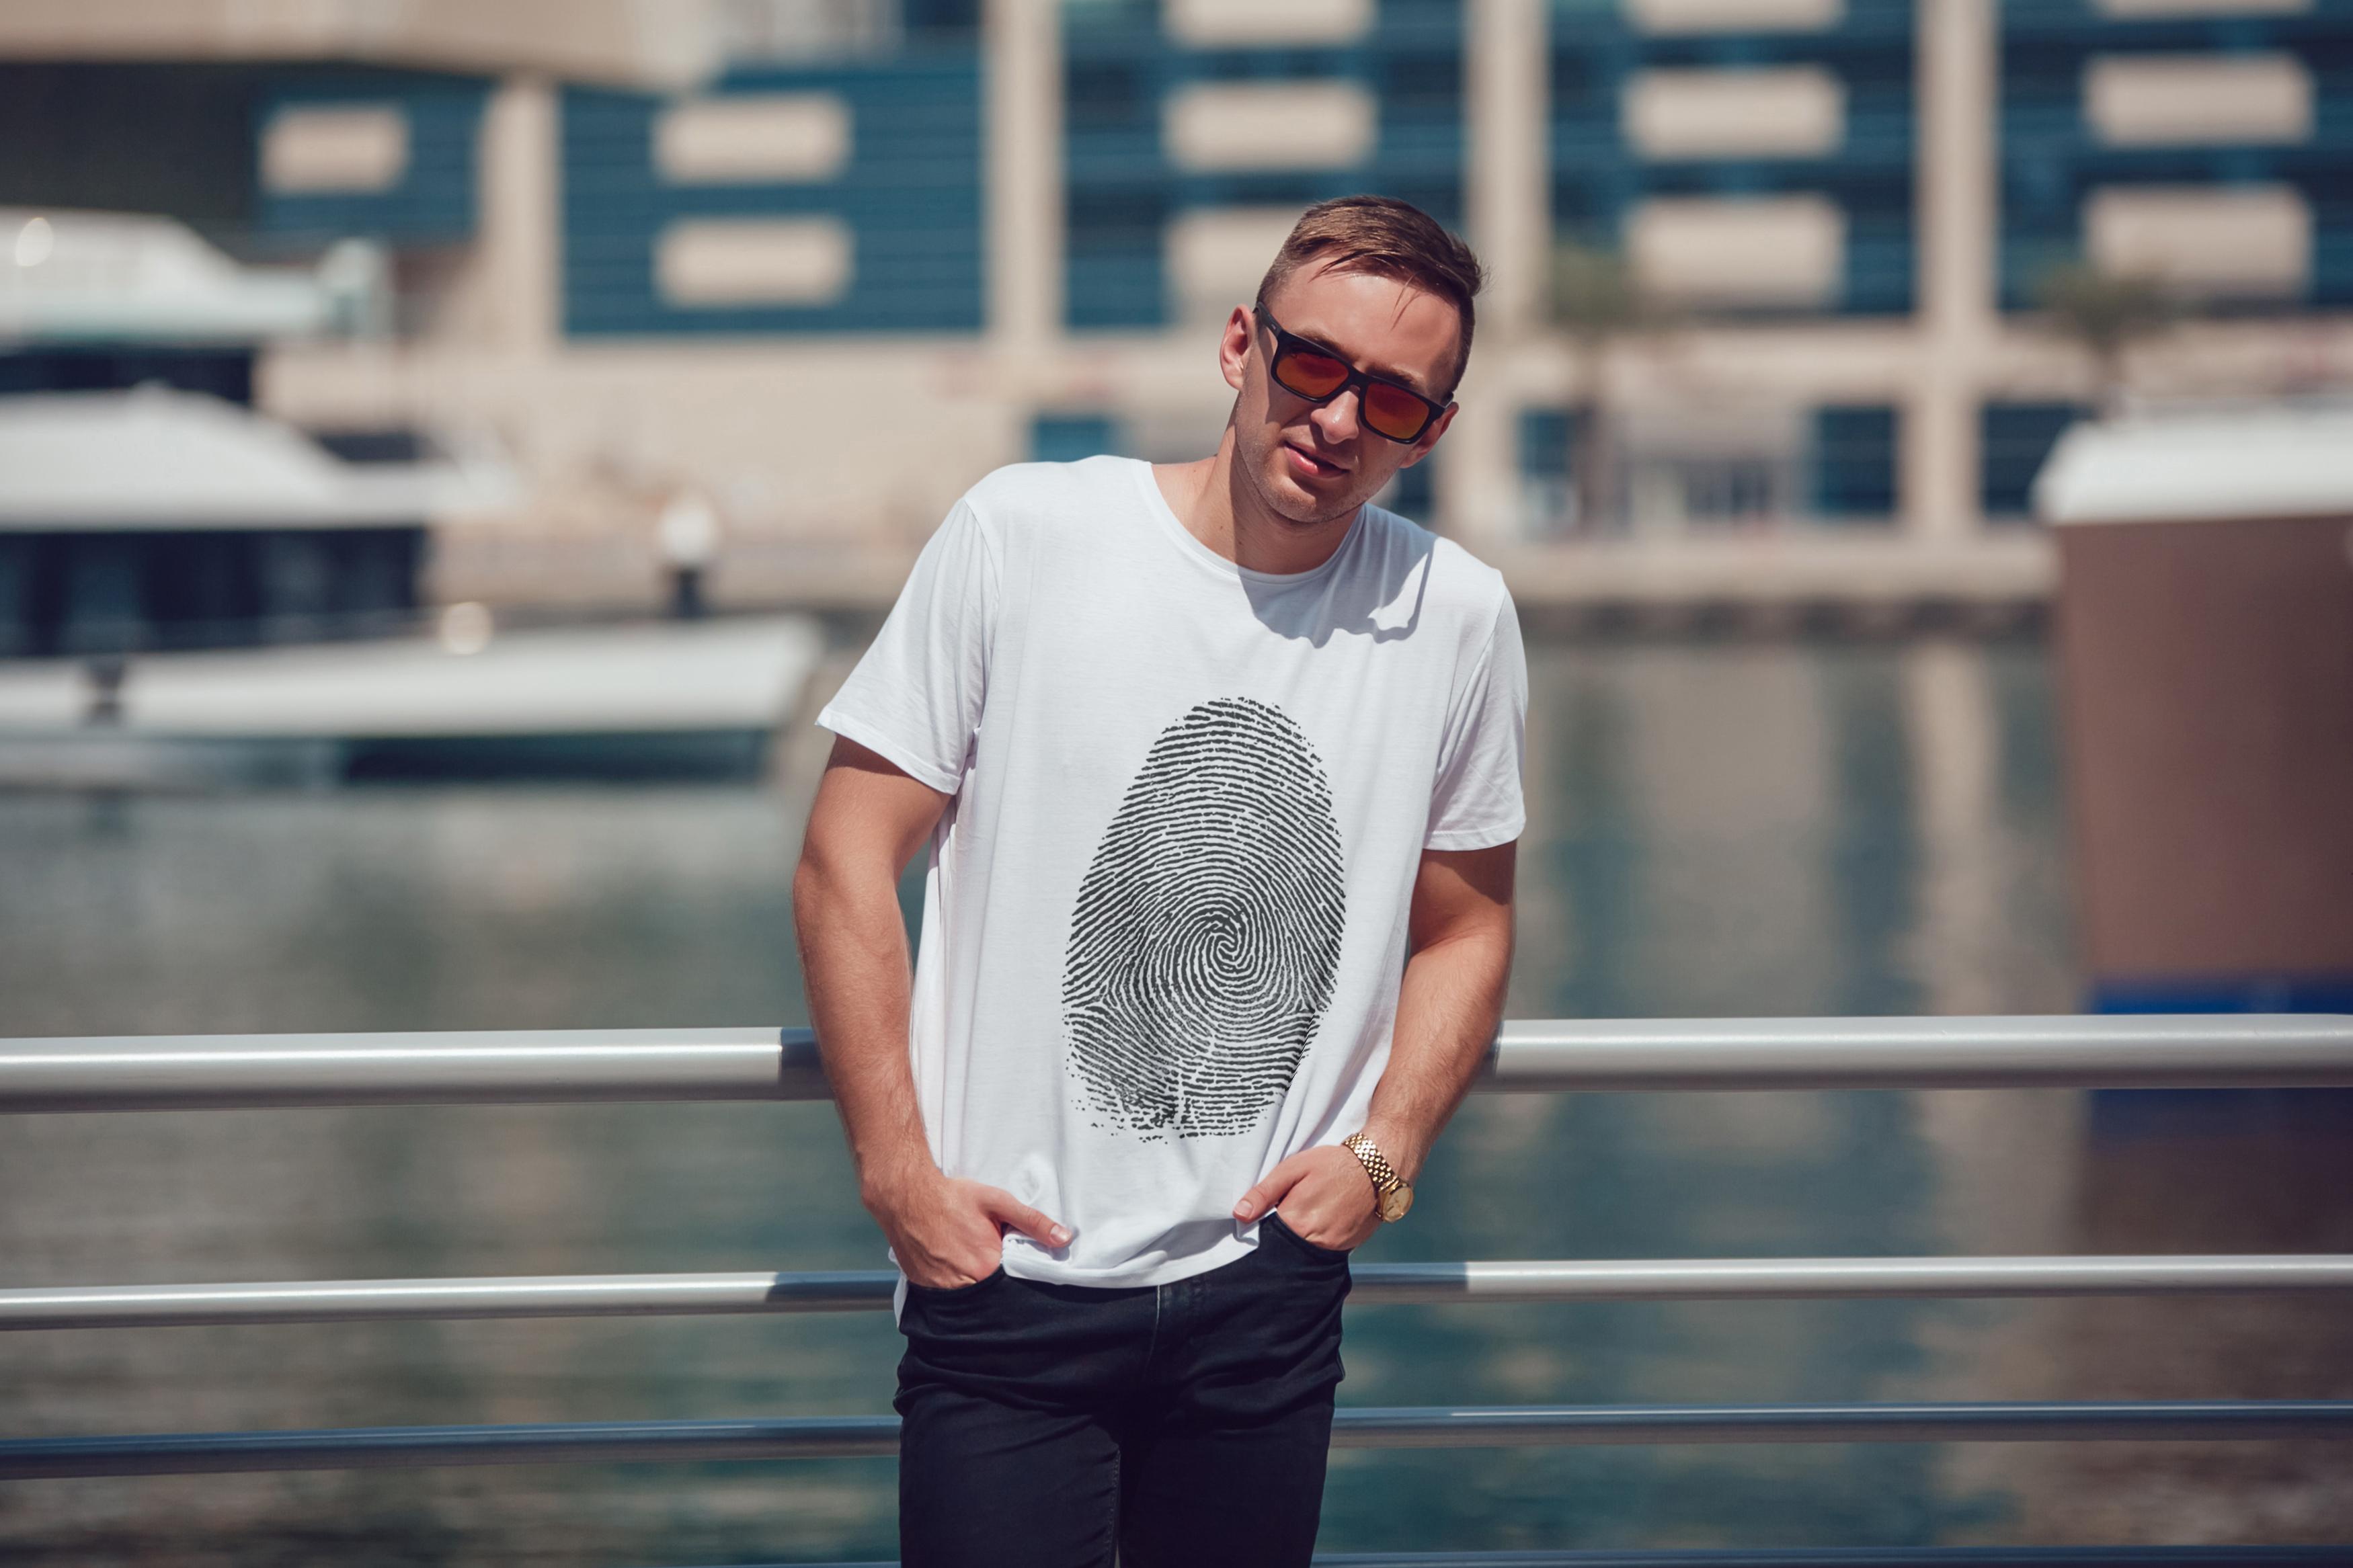 Men's T-Shirt Mock-Up Vol.5 2017 example image 19